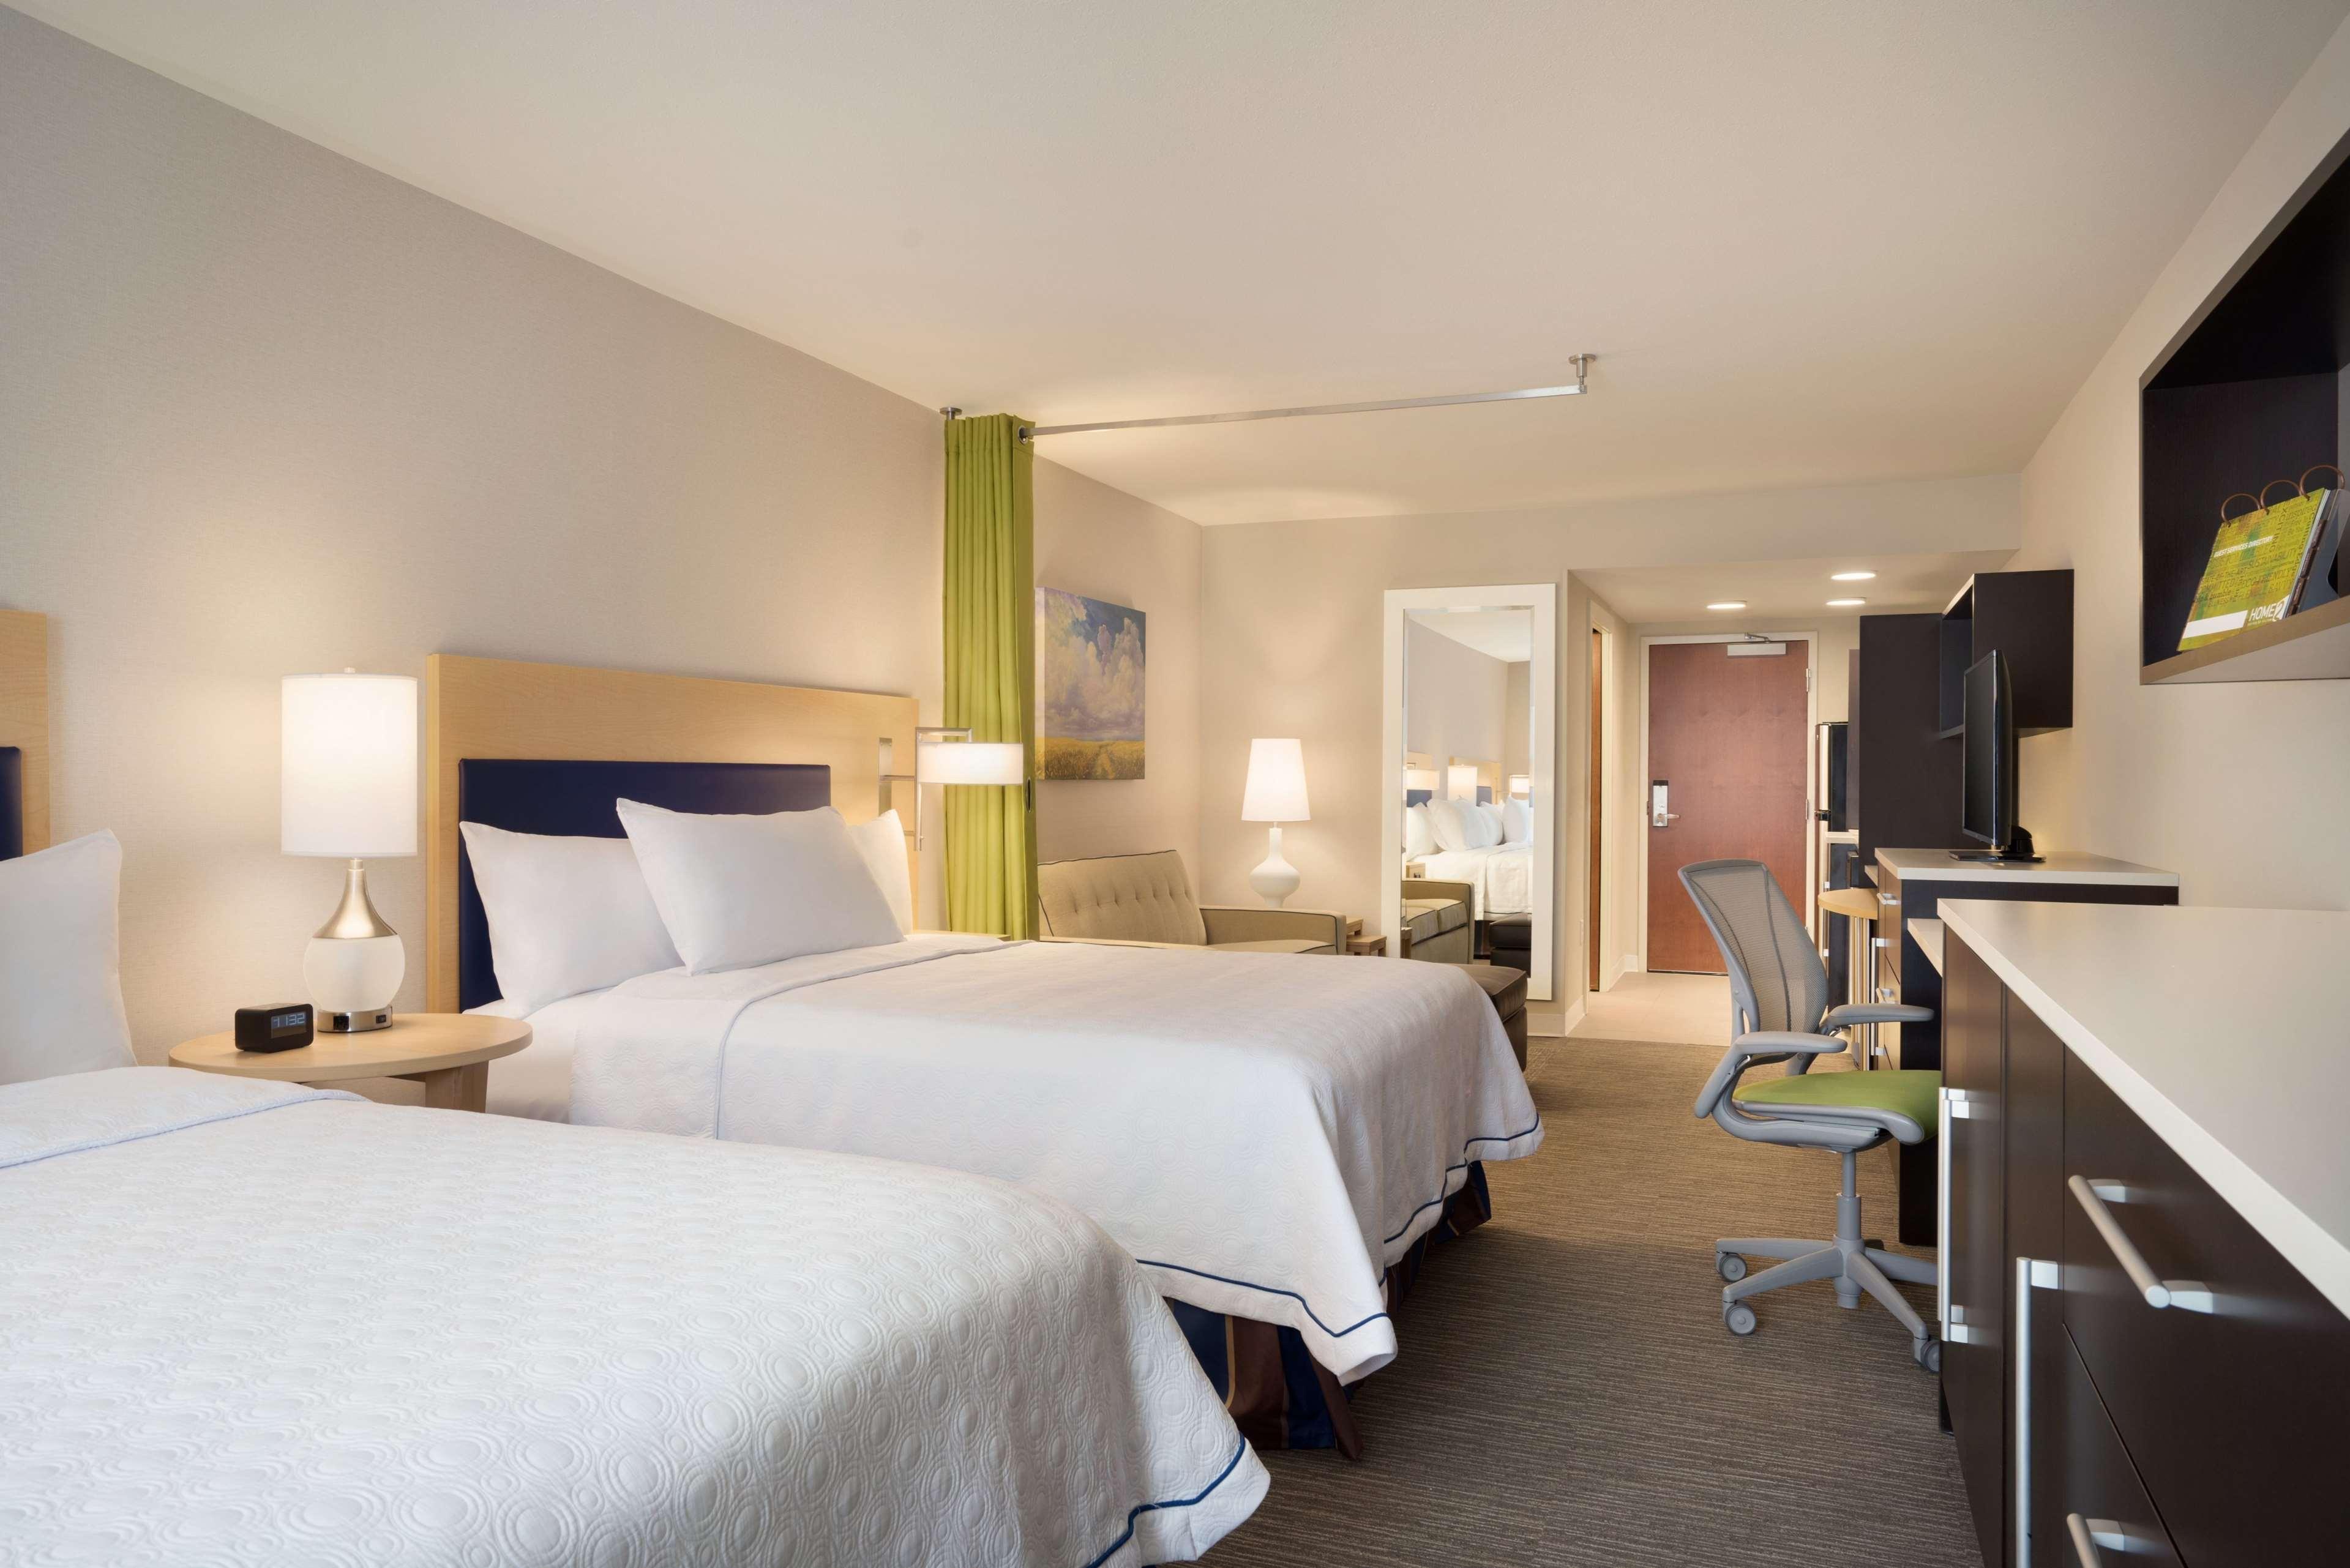 Home2 Suites by Hilton Leavenworth Downtown image 32